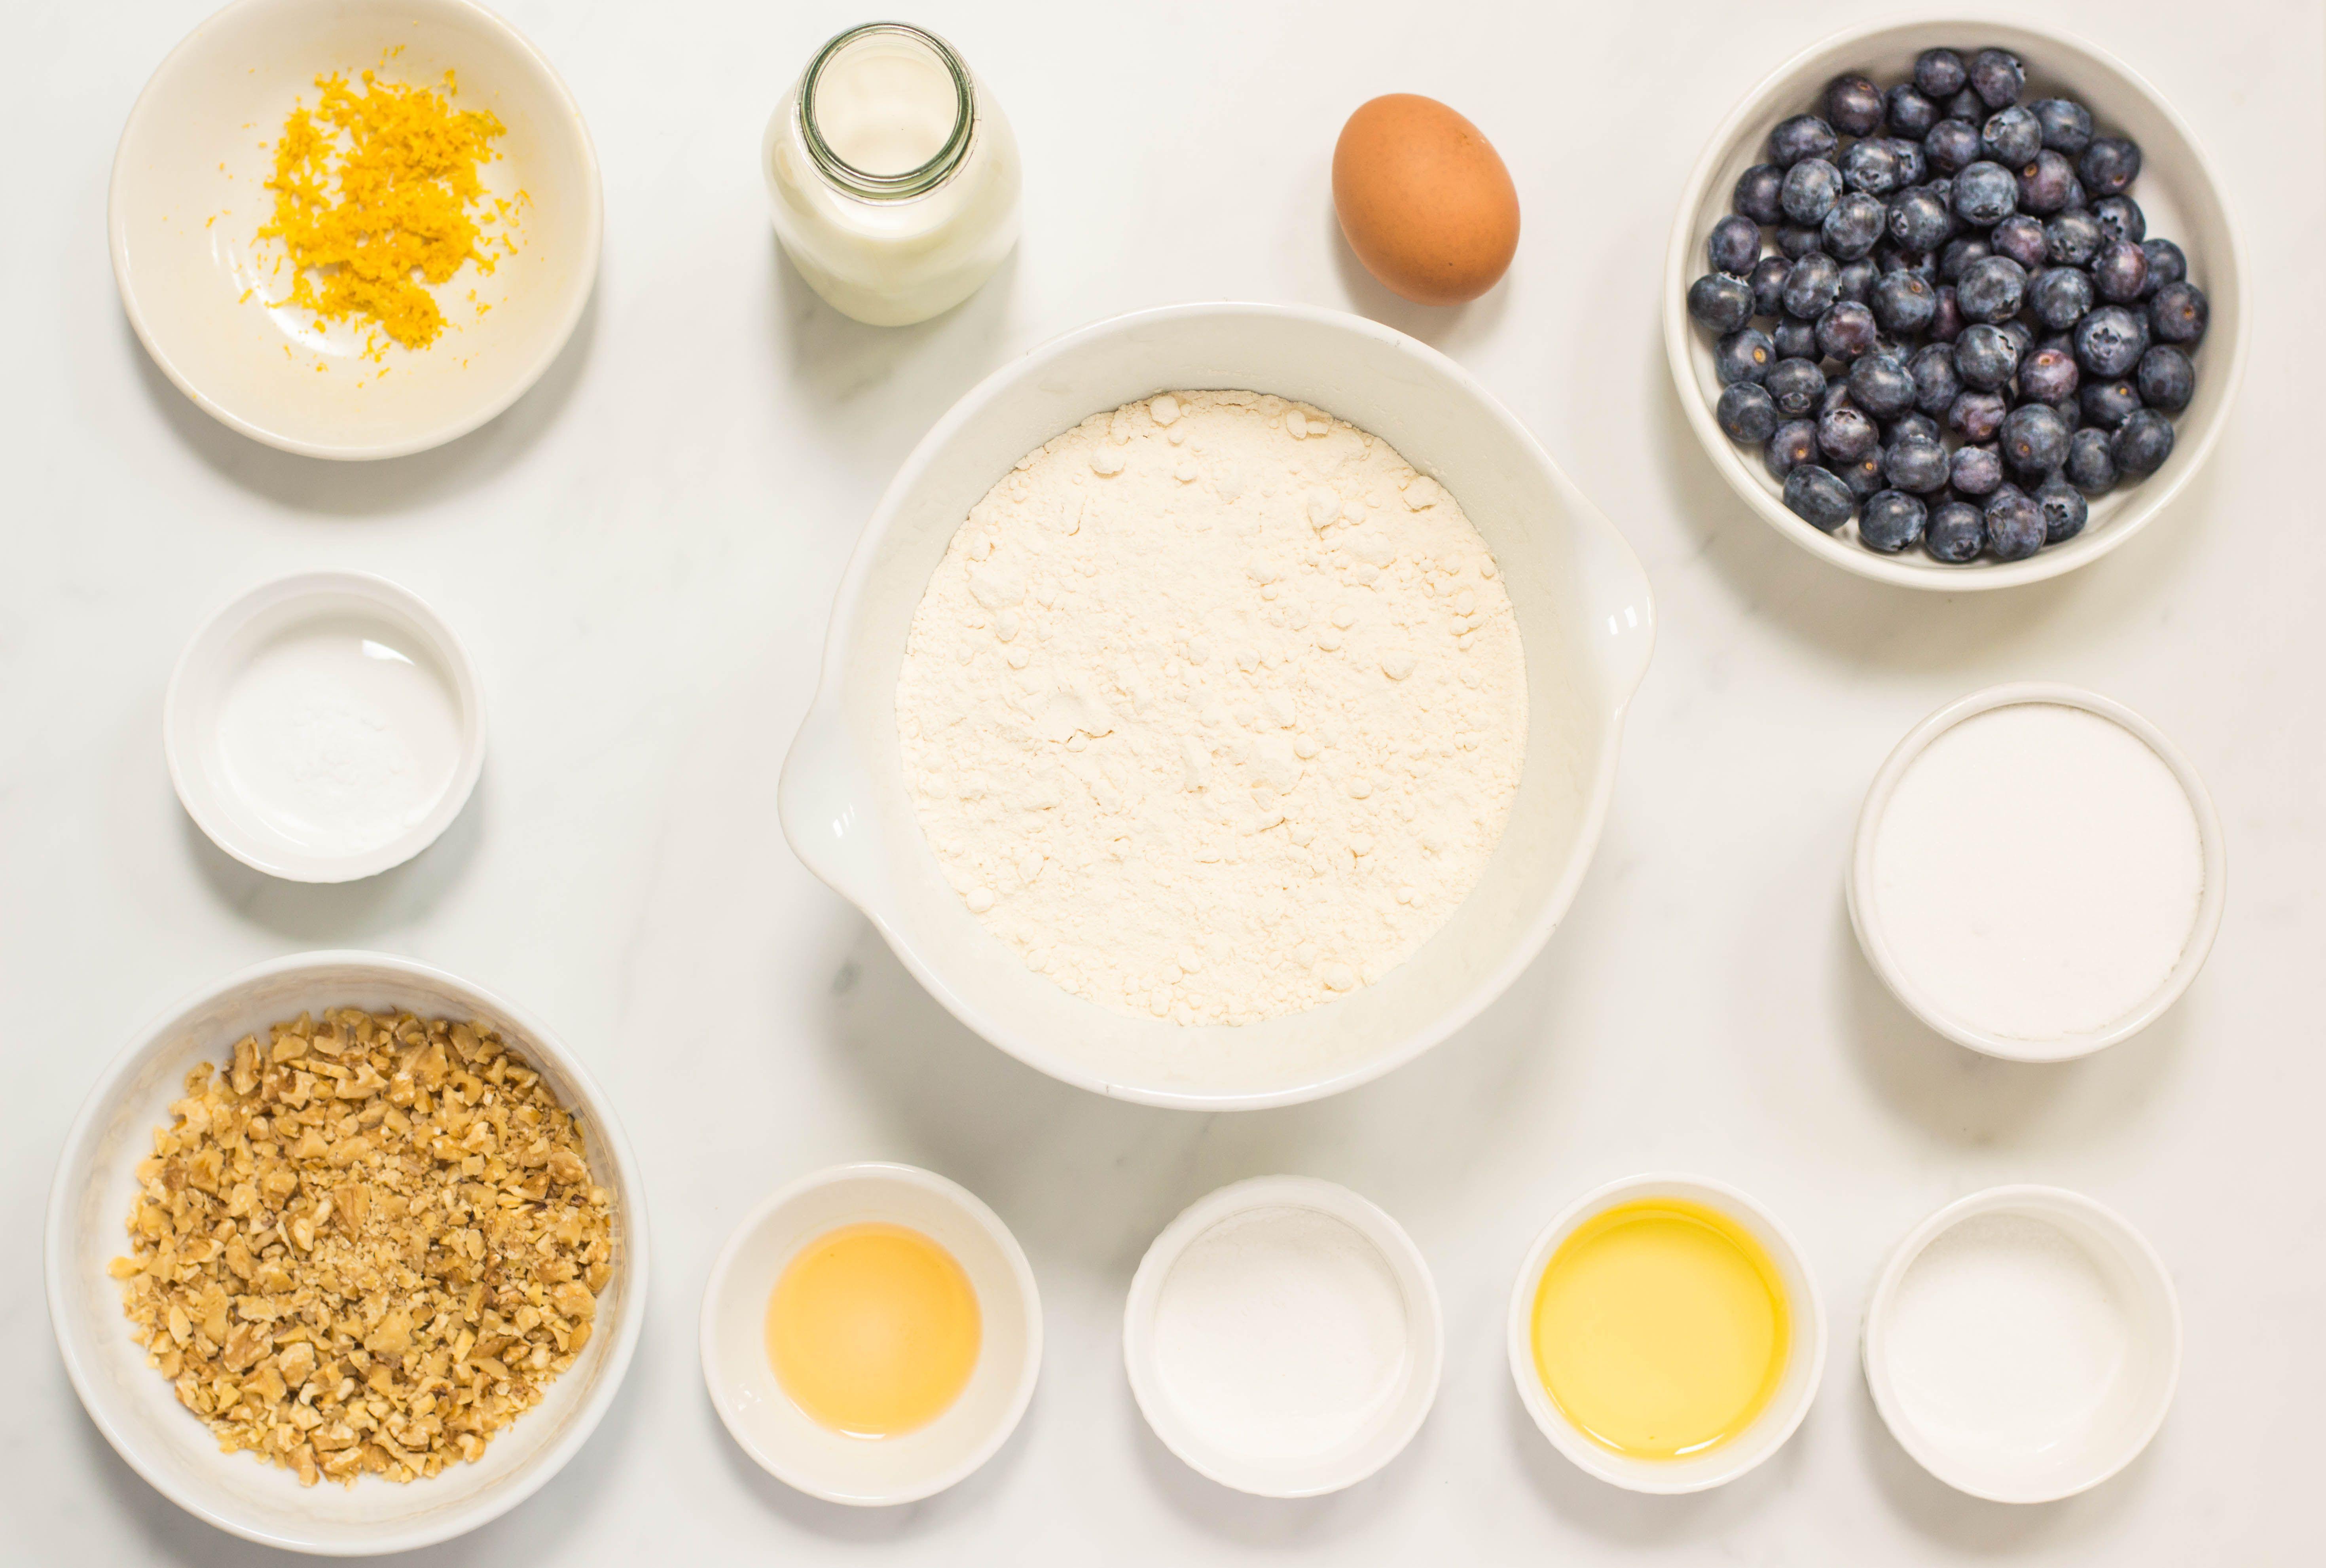 Blueberry Bread recipe ingredients